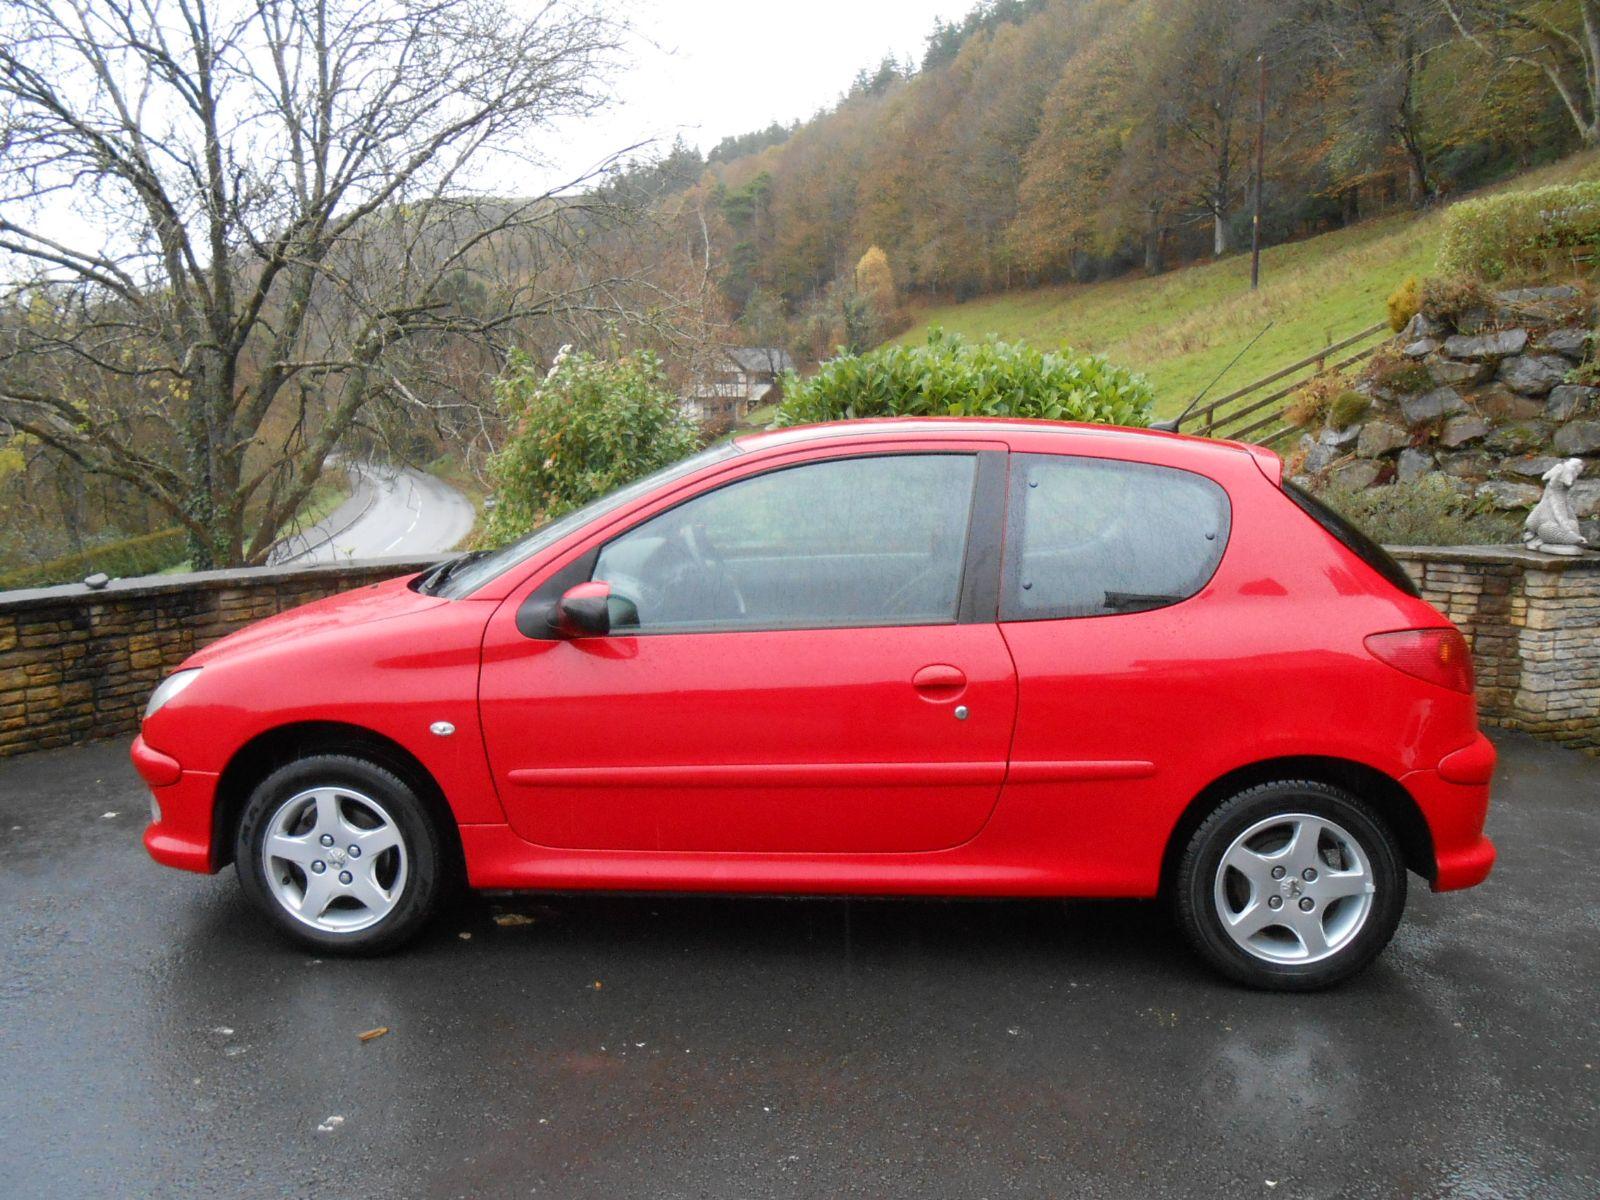 Peugeot 206 1 4 Verve 3 Door Car For Sale Llanidloes Powys